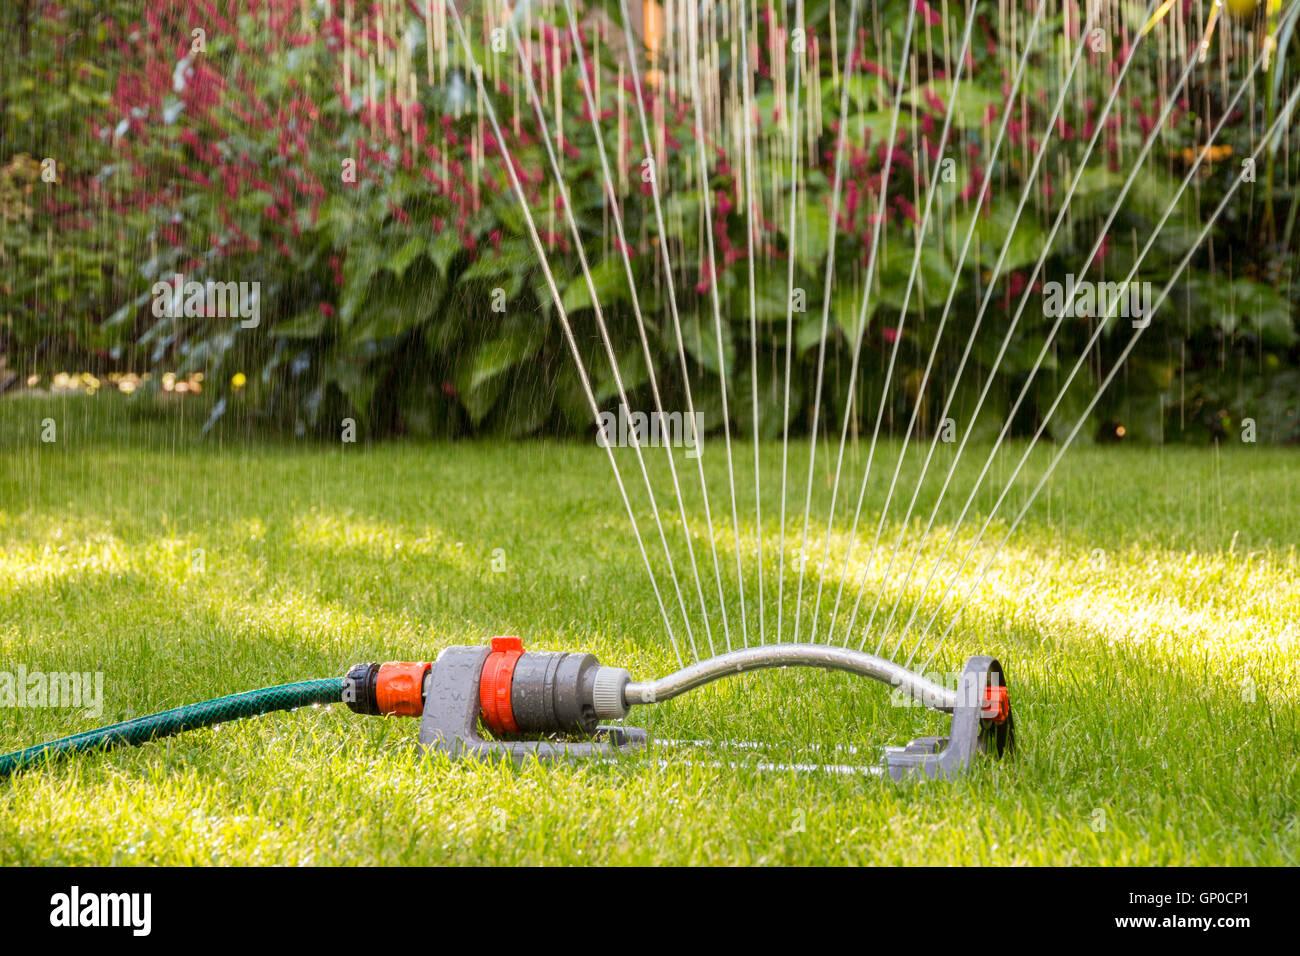 Sprinkler Watering Lawn Close Up Stock Photos Sprinkler